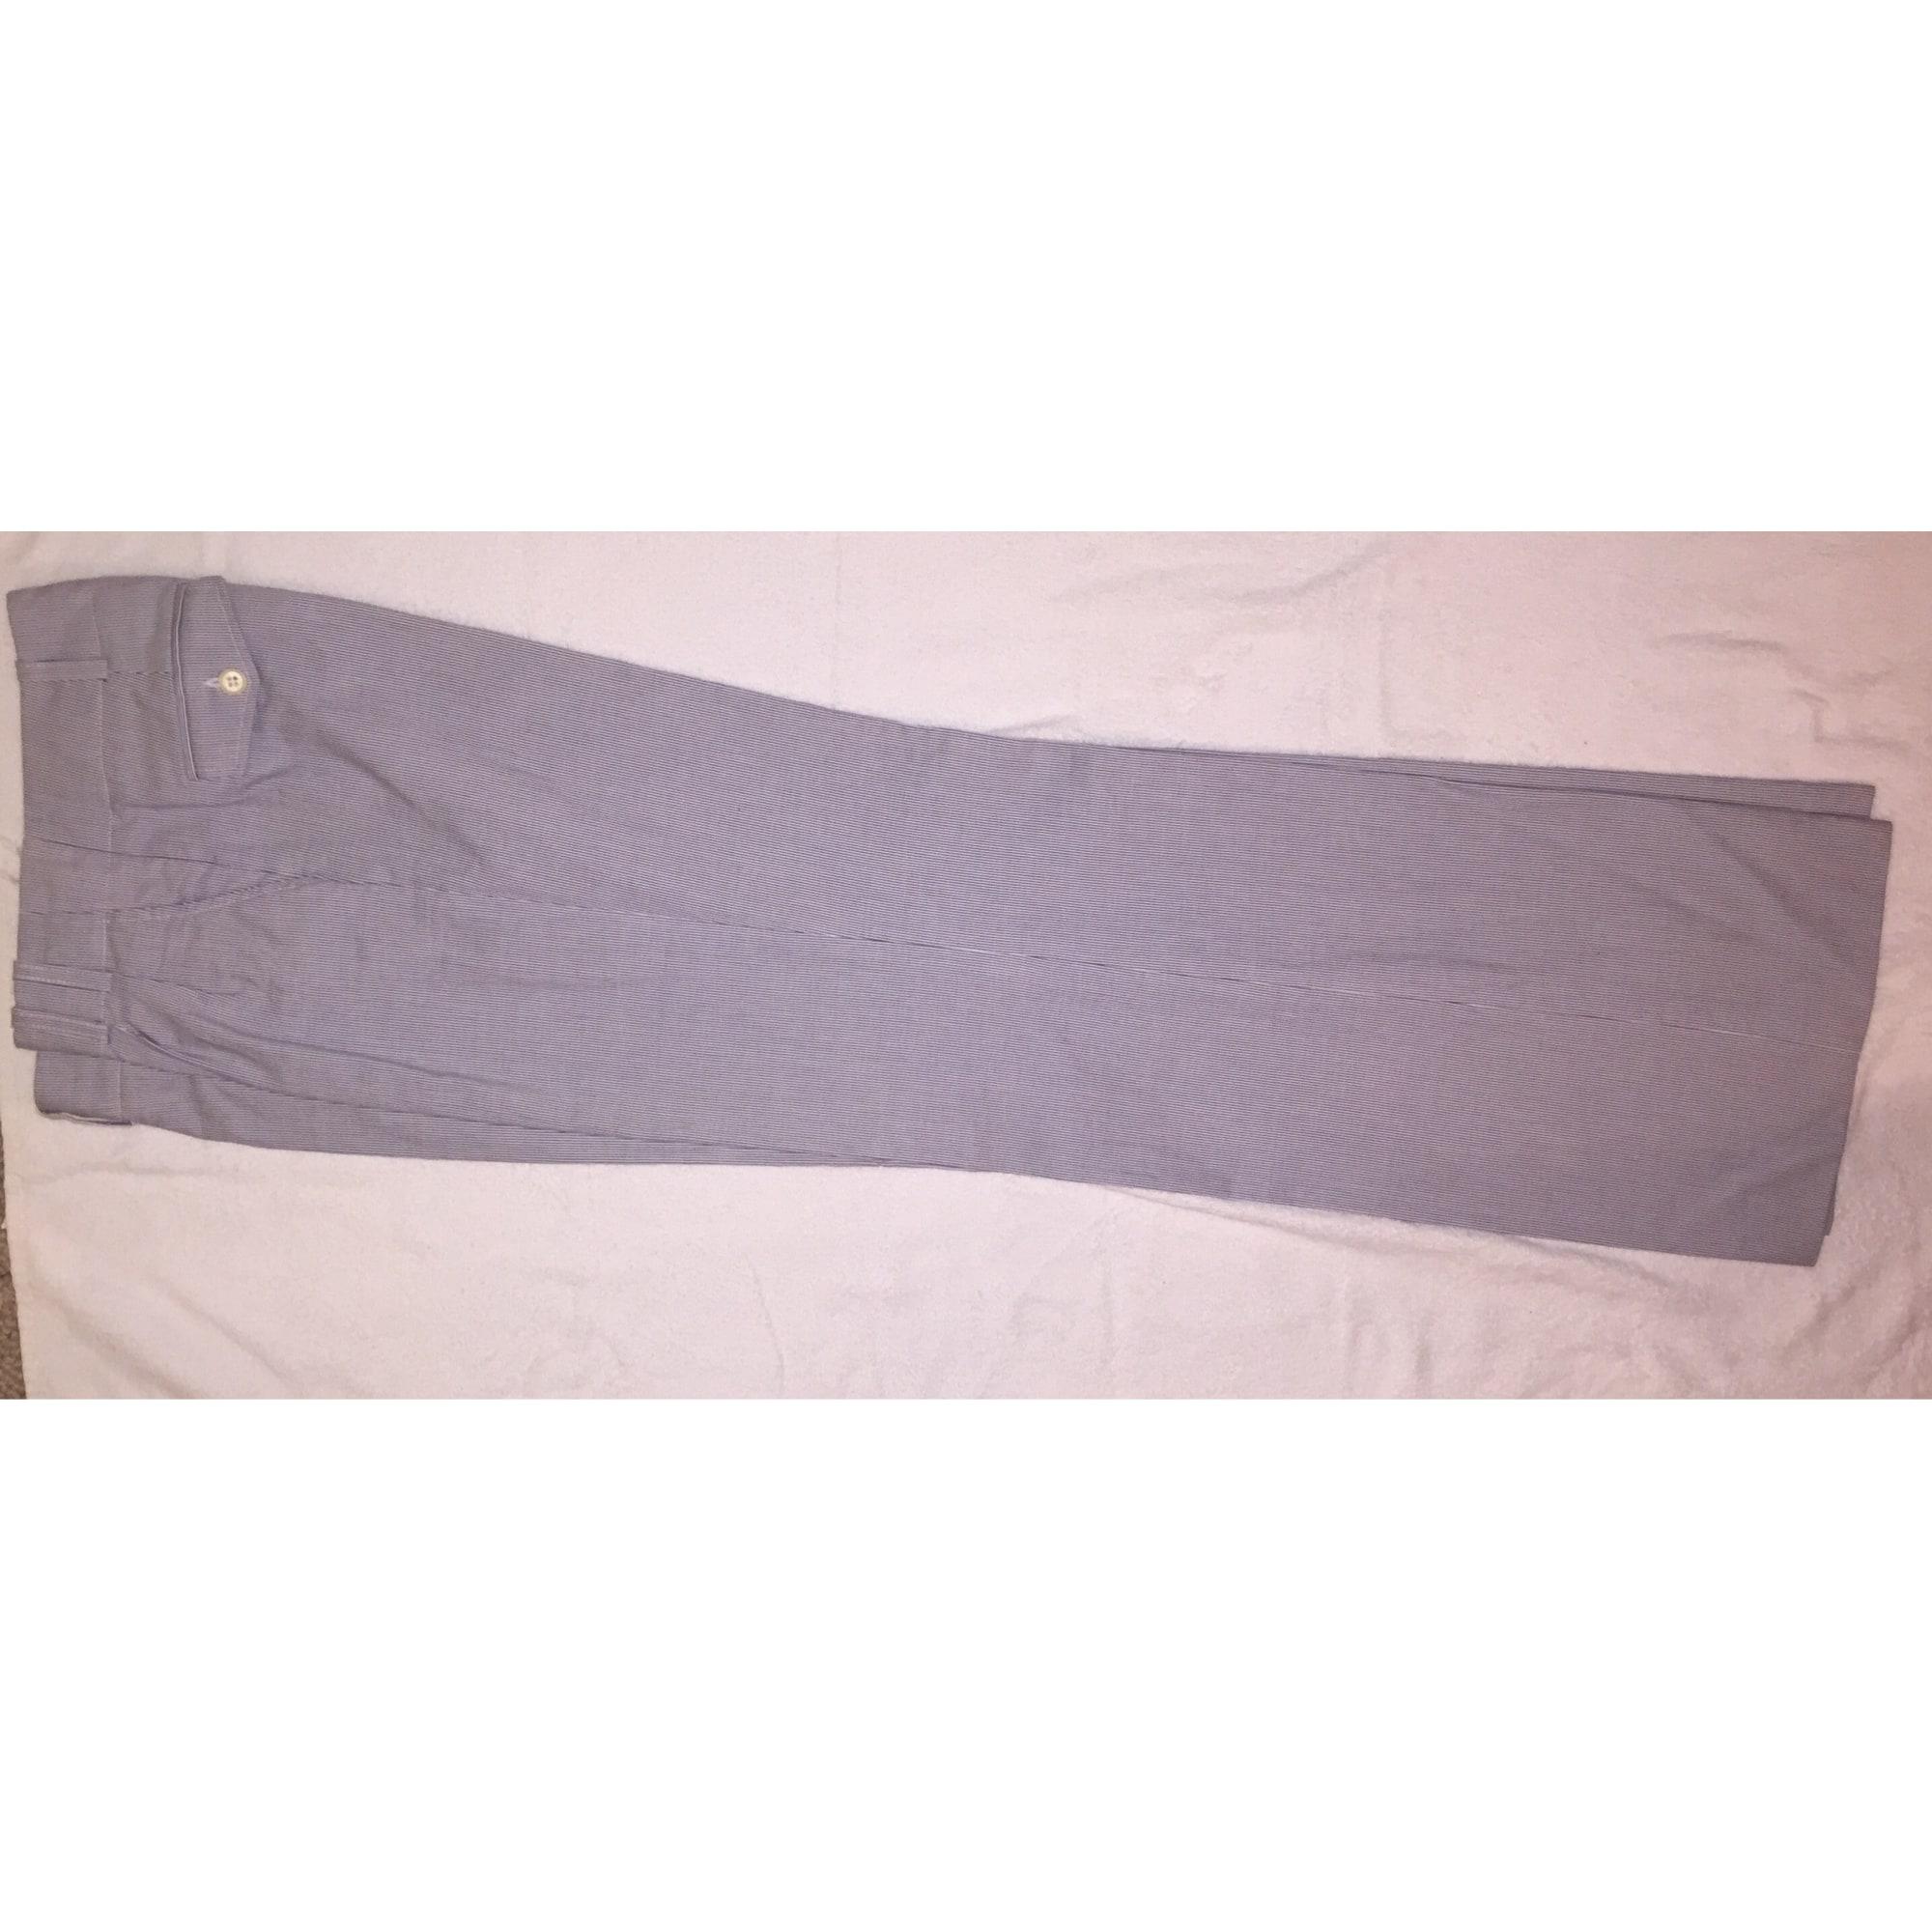 Pantalon large PABLO PAR GÉRARD DAREL Bleu, bleu marine, bleu turquoise